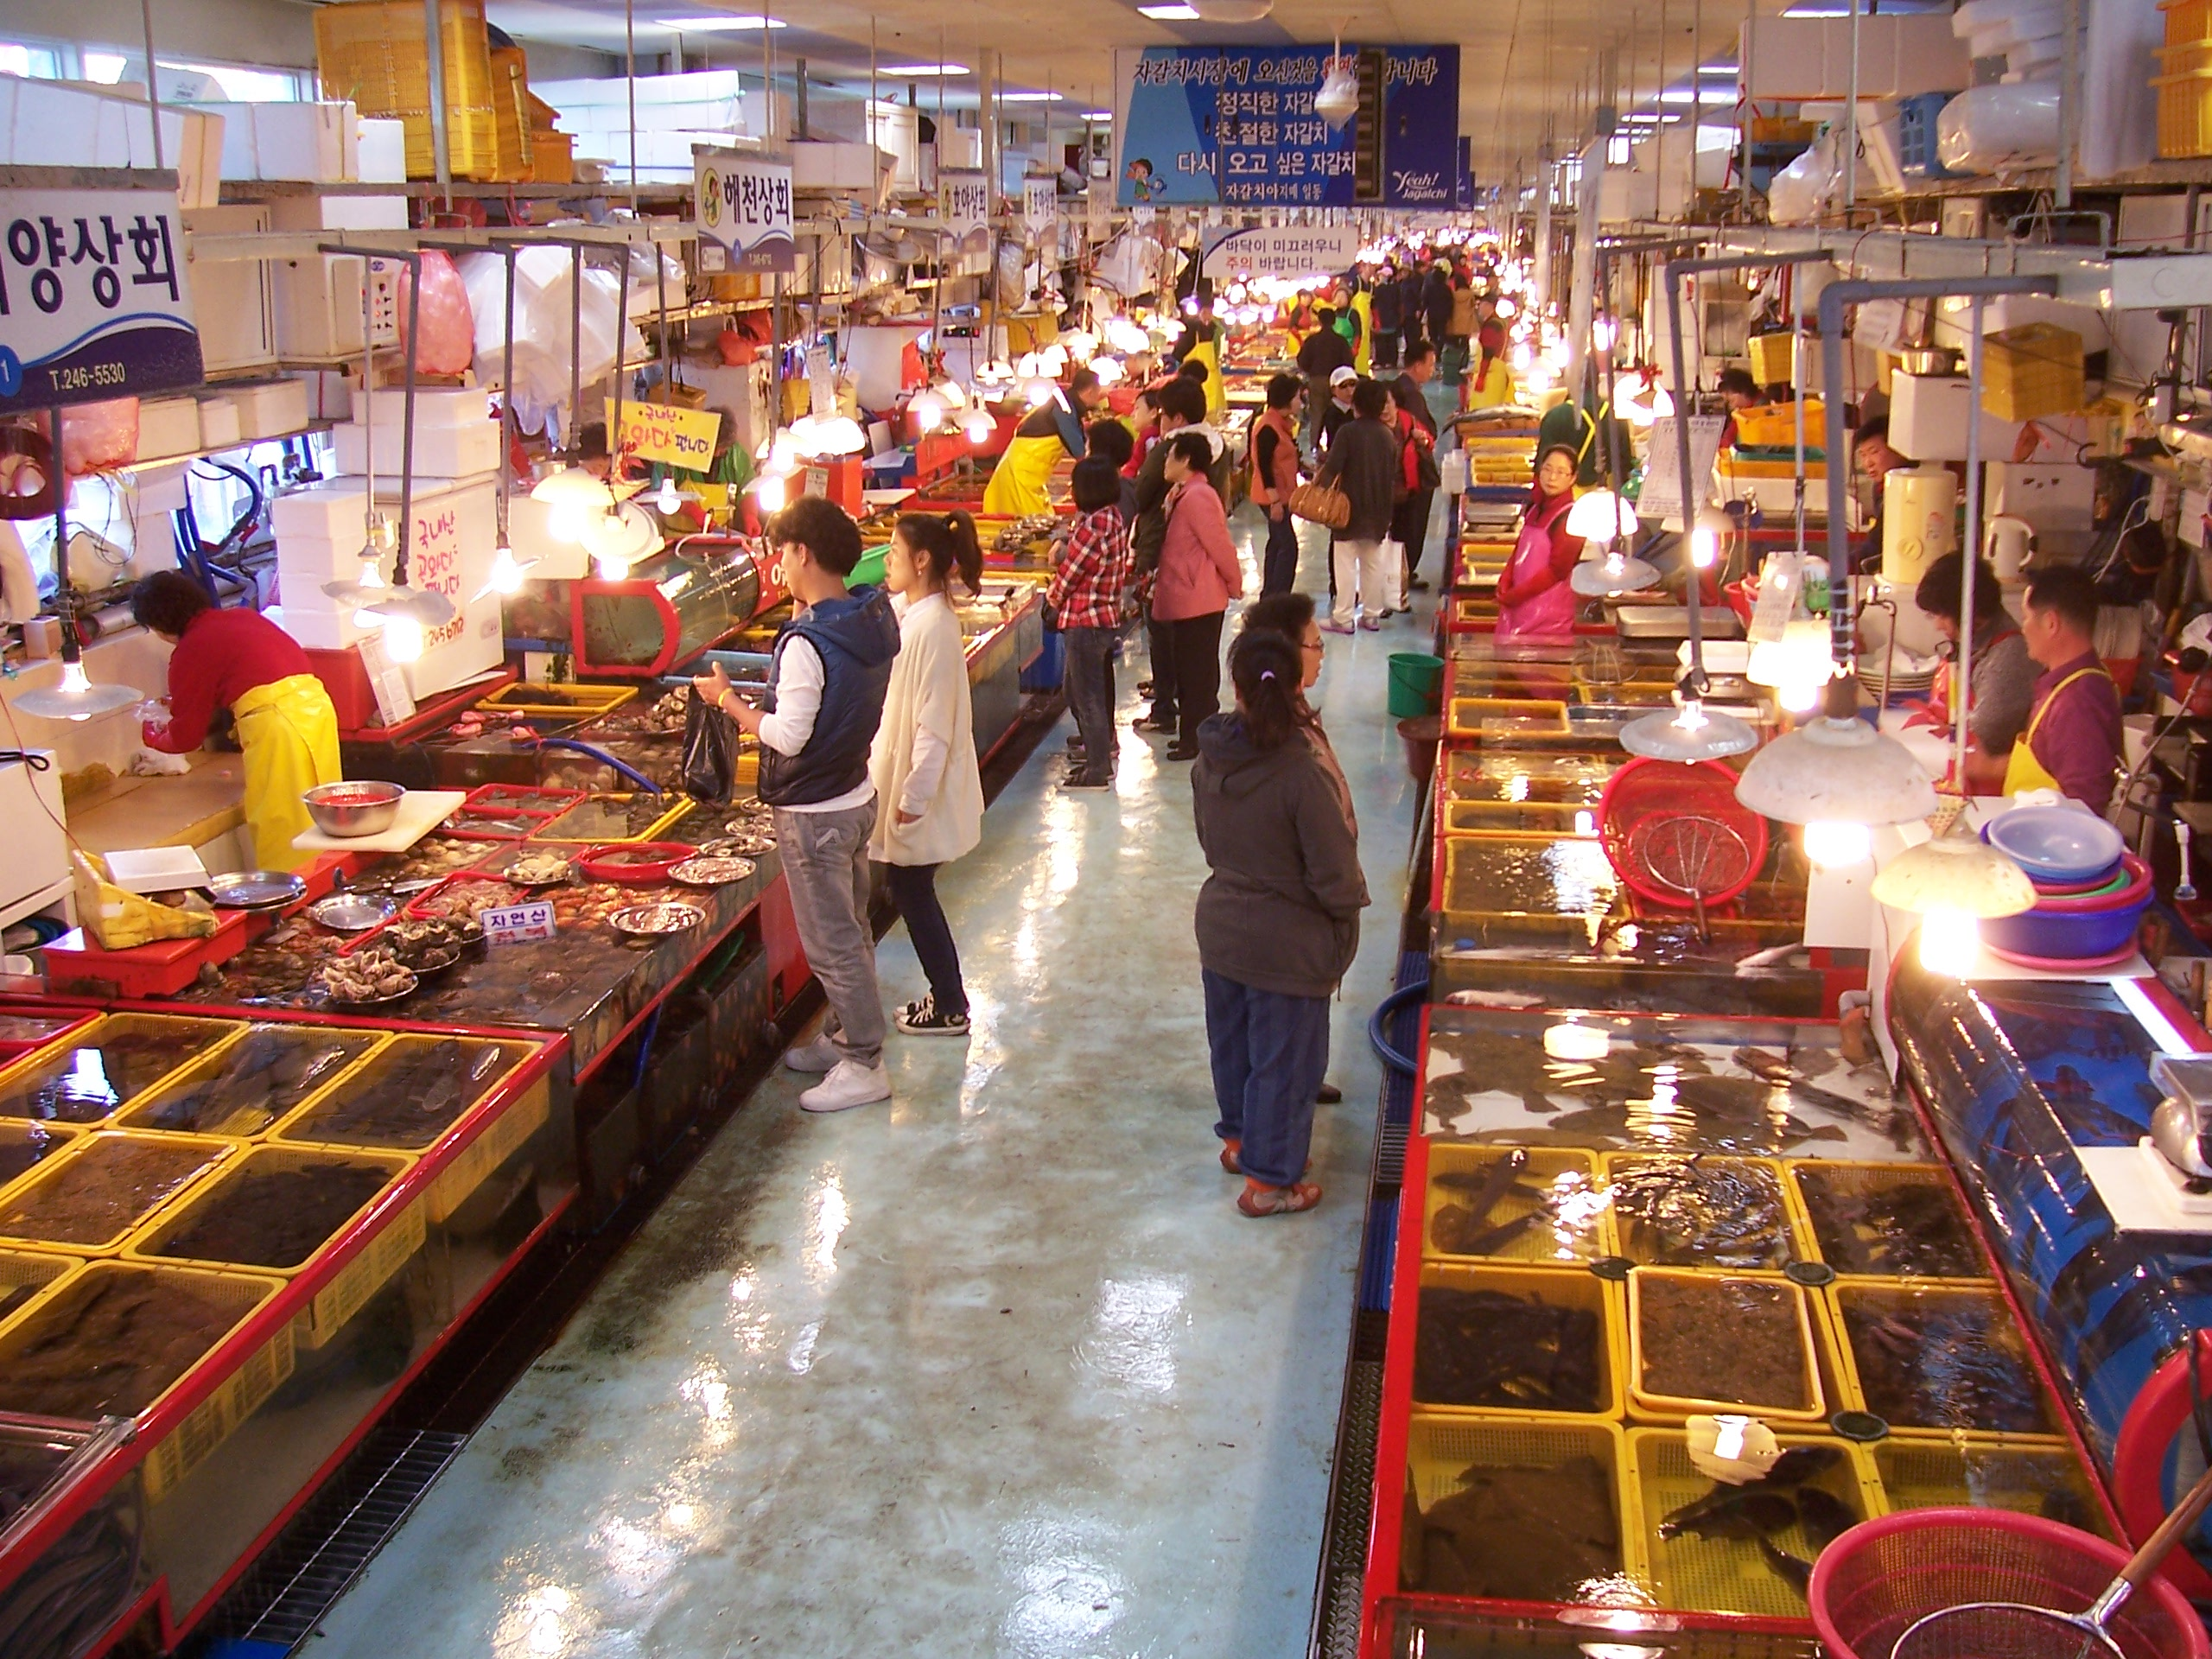 File:Inside Jagalchi Fish Market, Busan.jpg - Wikimedia Commons